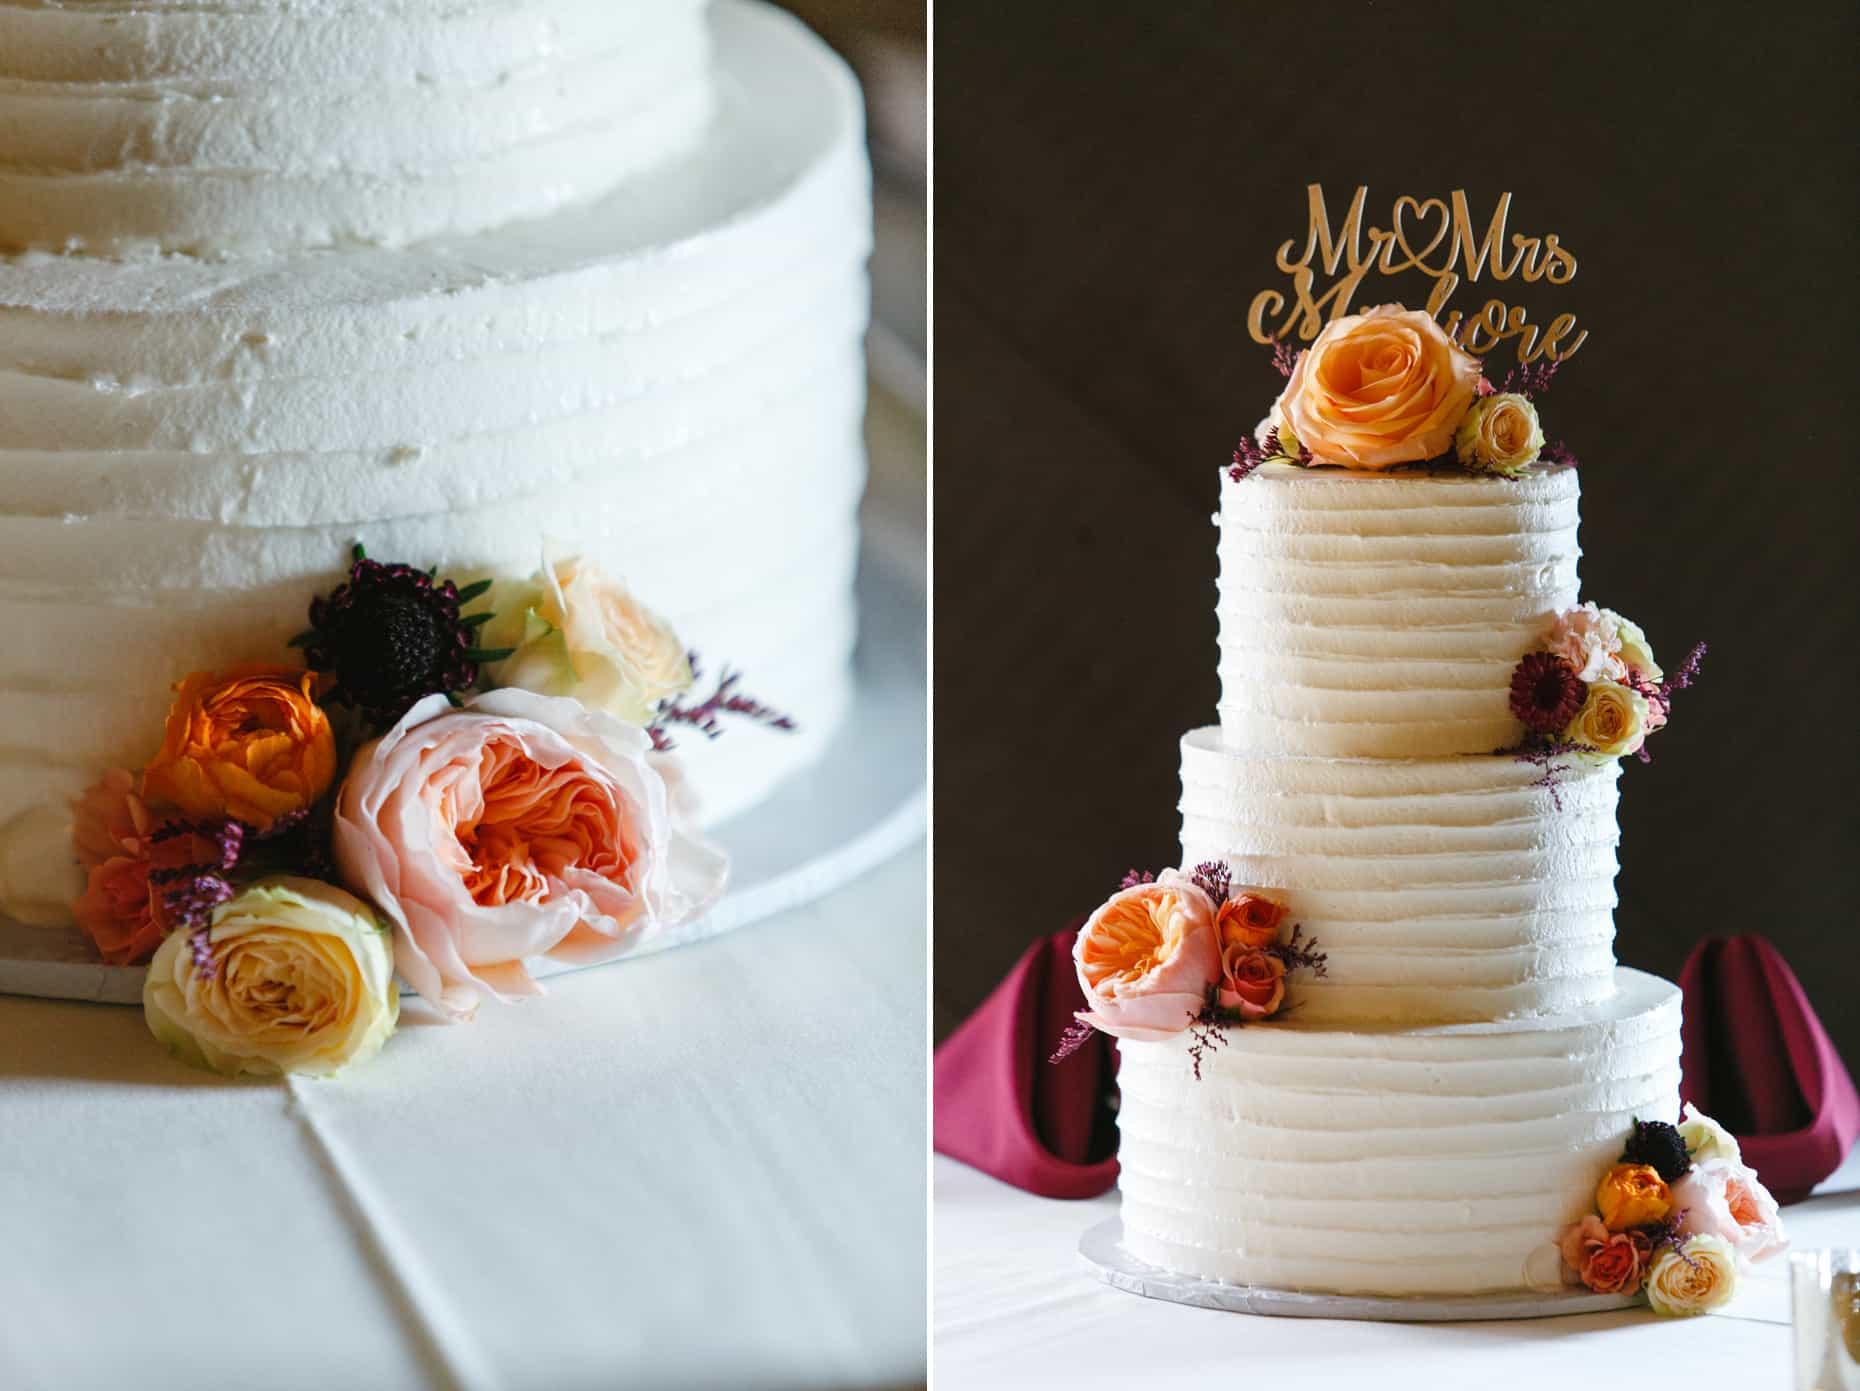 The Masters Baker wedding cake